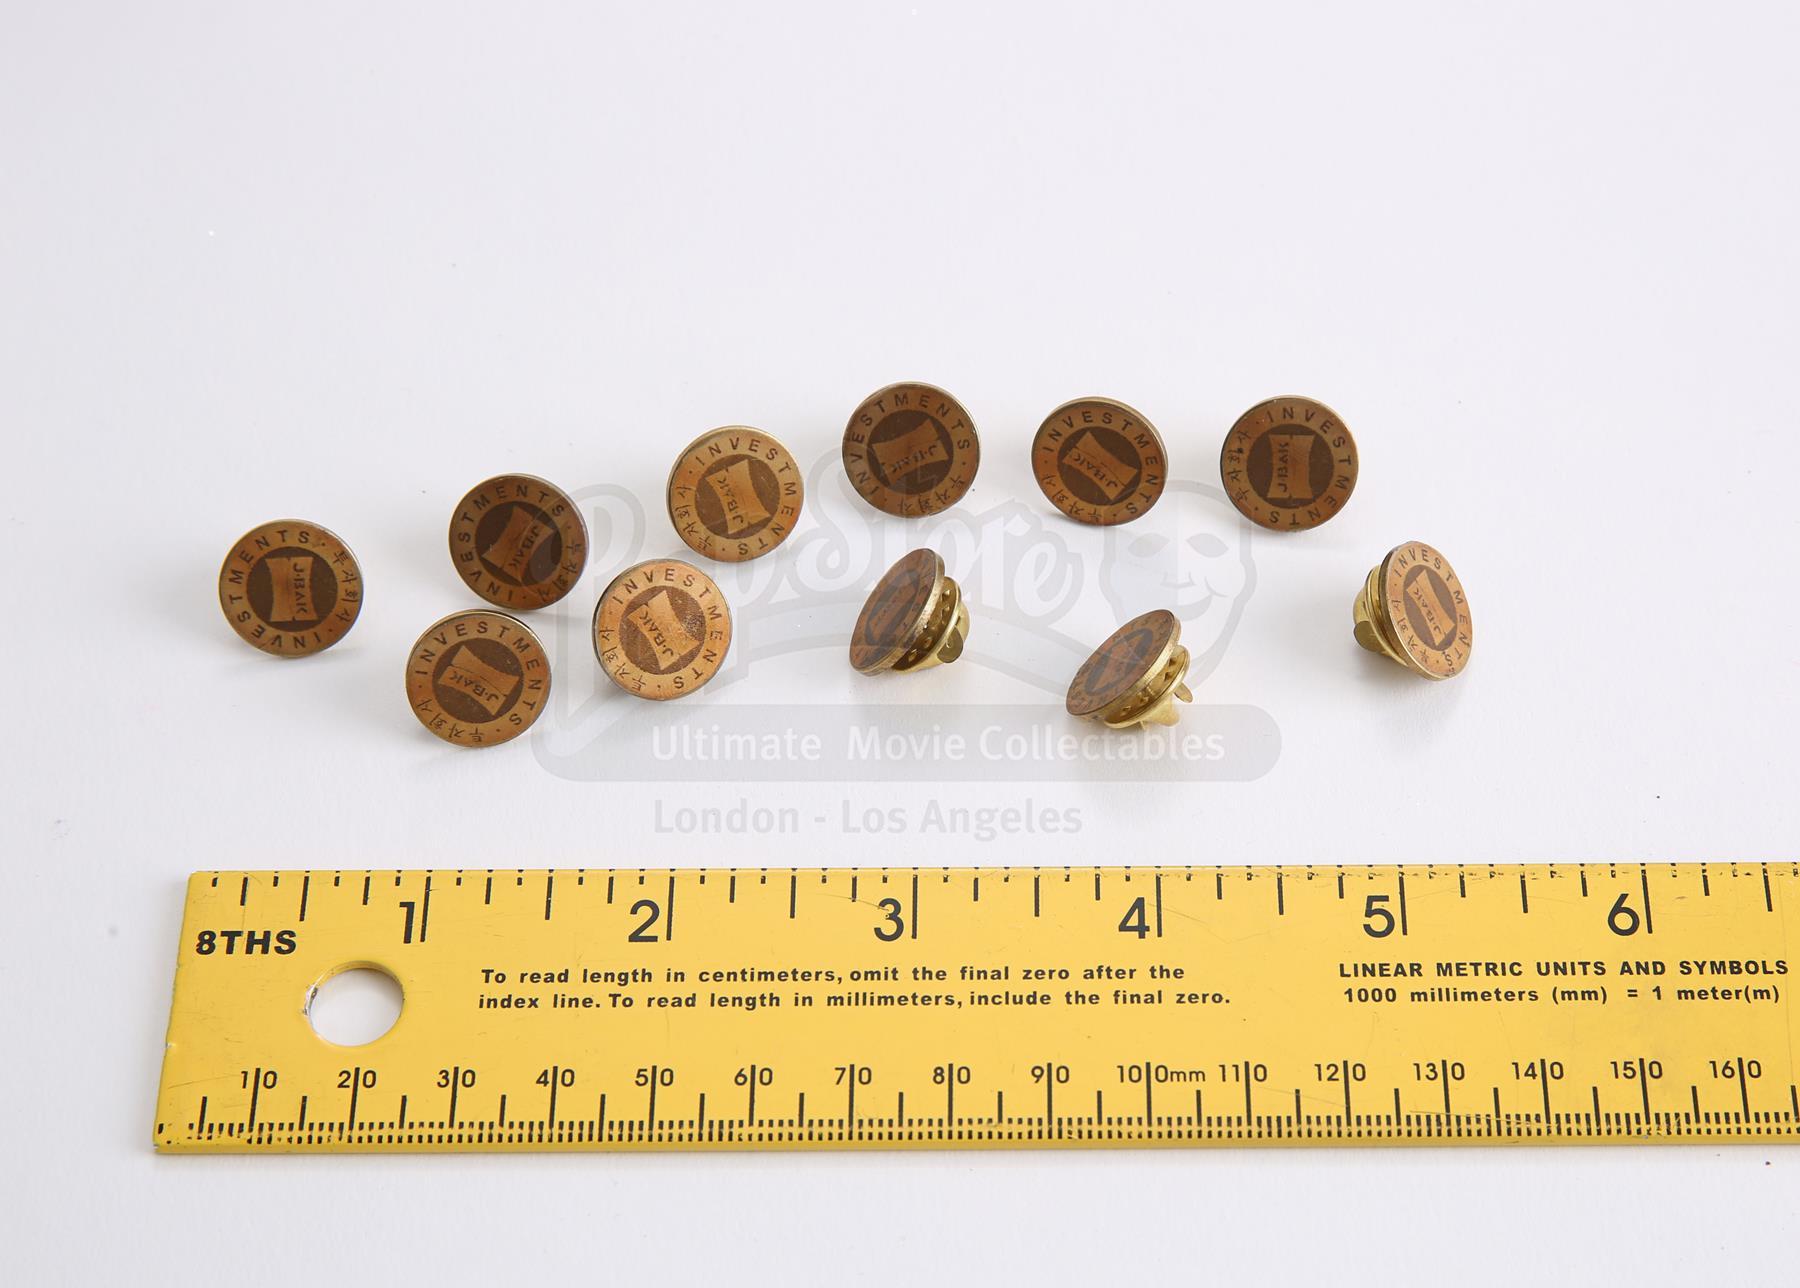 S2E11 - You Want A War?: 11 J  Bak Bodyguard Pins - Current price: $50